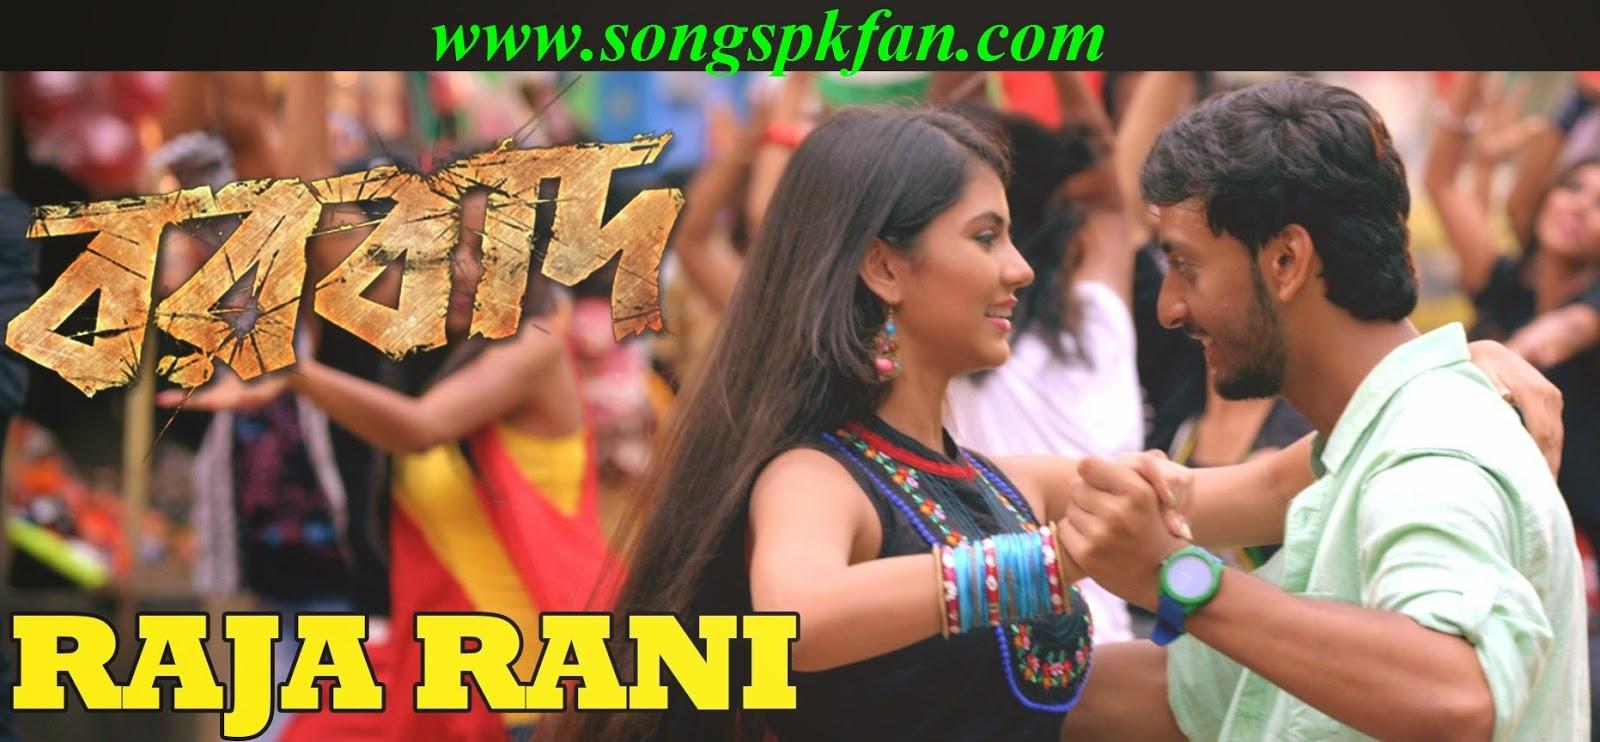 Raja Rani full movie on hotstarcom